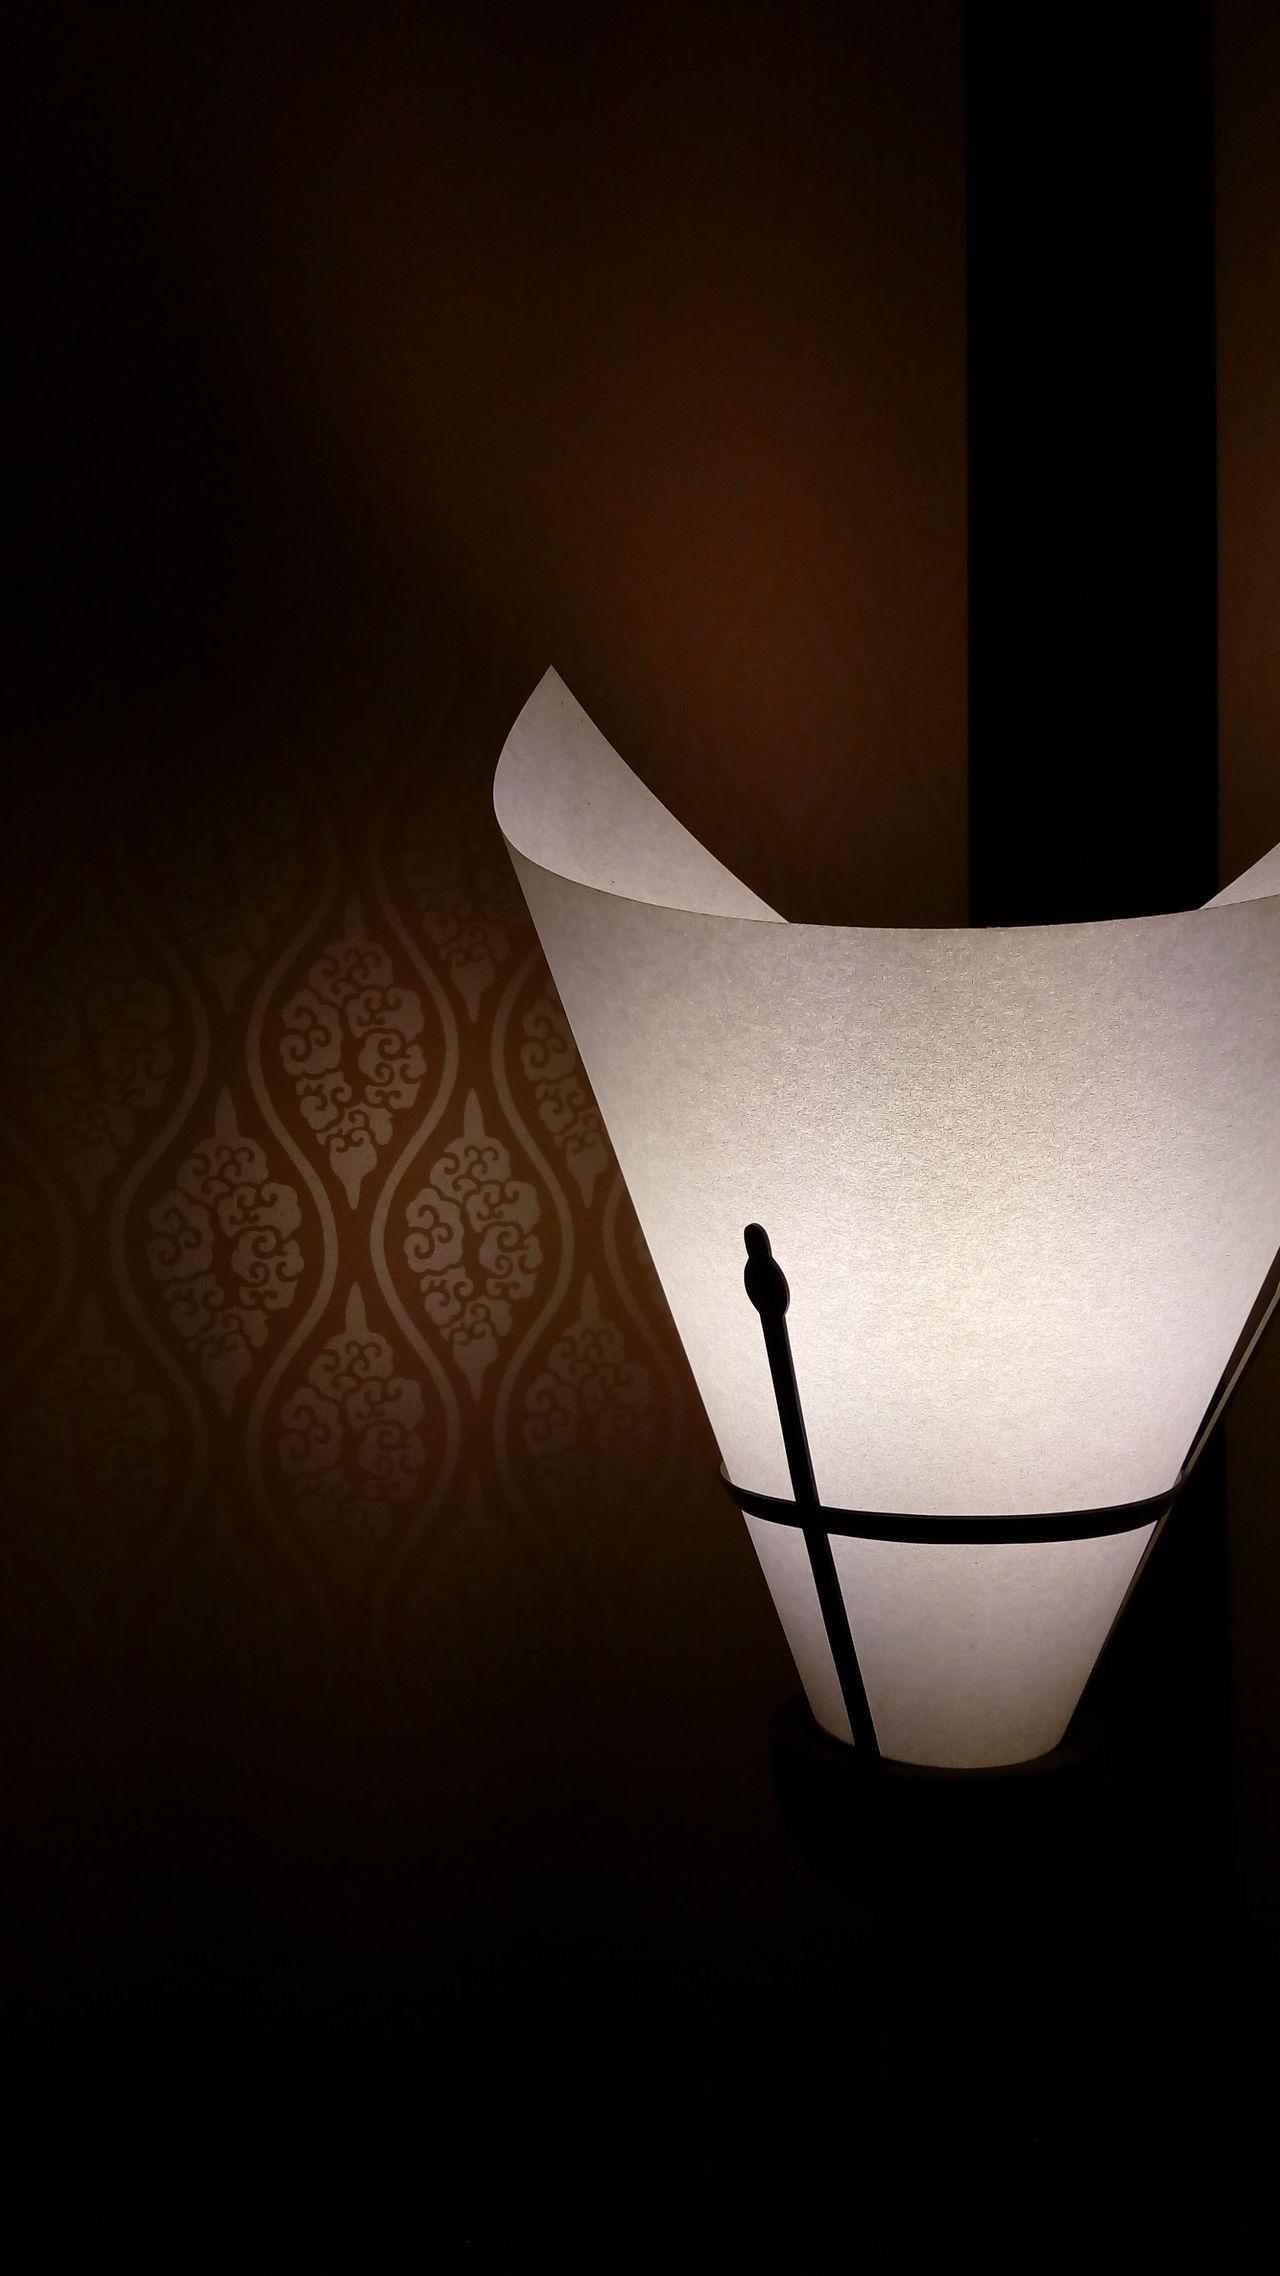 Enchanted  Light And Shadow Light Lump Lumpshade Garden Holiday Iwami Ginzan Izumo Izumo Japan Izumo Taisha Journey Furnitures Old Buildings Old Town People Japanese Lumpshade Shimane Shrine Sightseeing Spa Trip Vacances Vacations The City Light